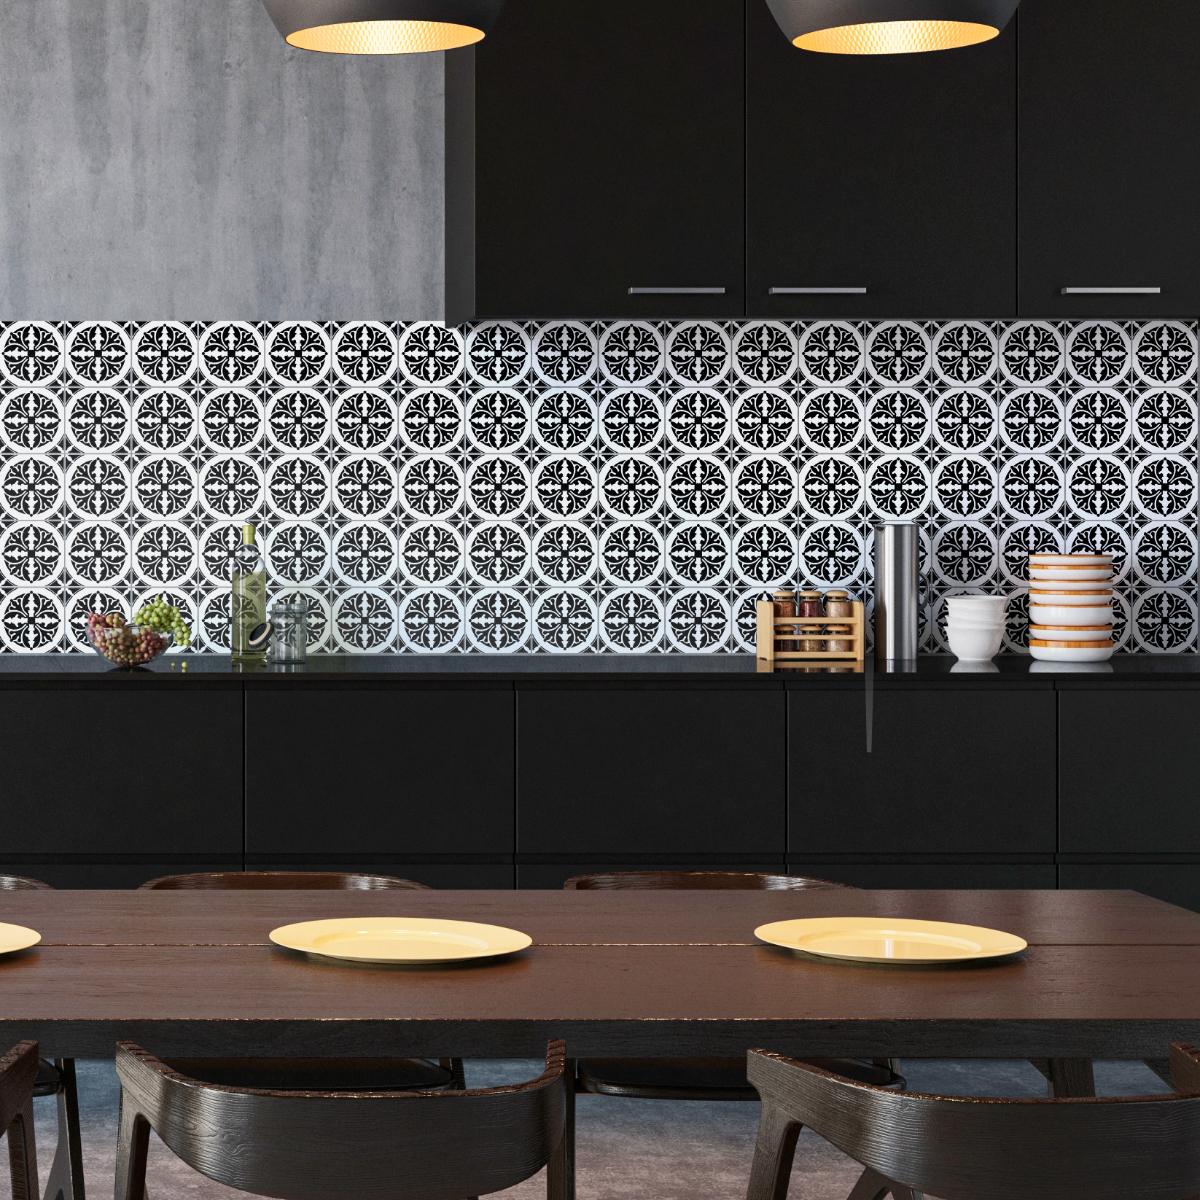 30 stickers carrelages azulejos carlos salle de bain mur salle de bain ambiance sticker. Black Bedroom Furniture Sets. Home Design Ideas